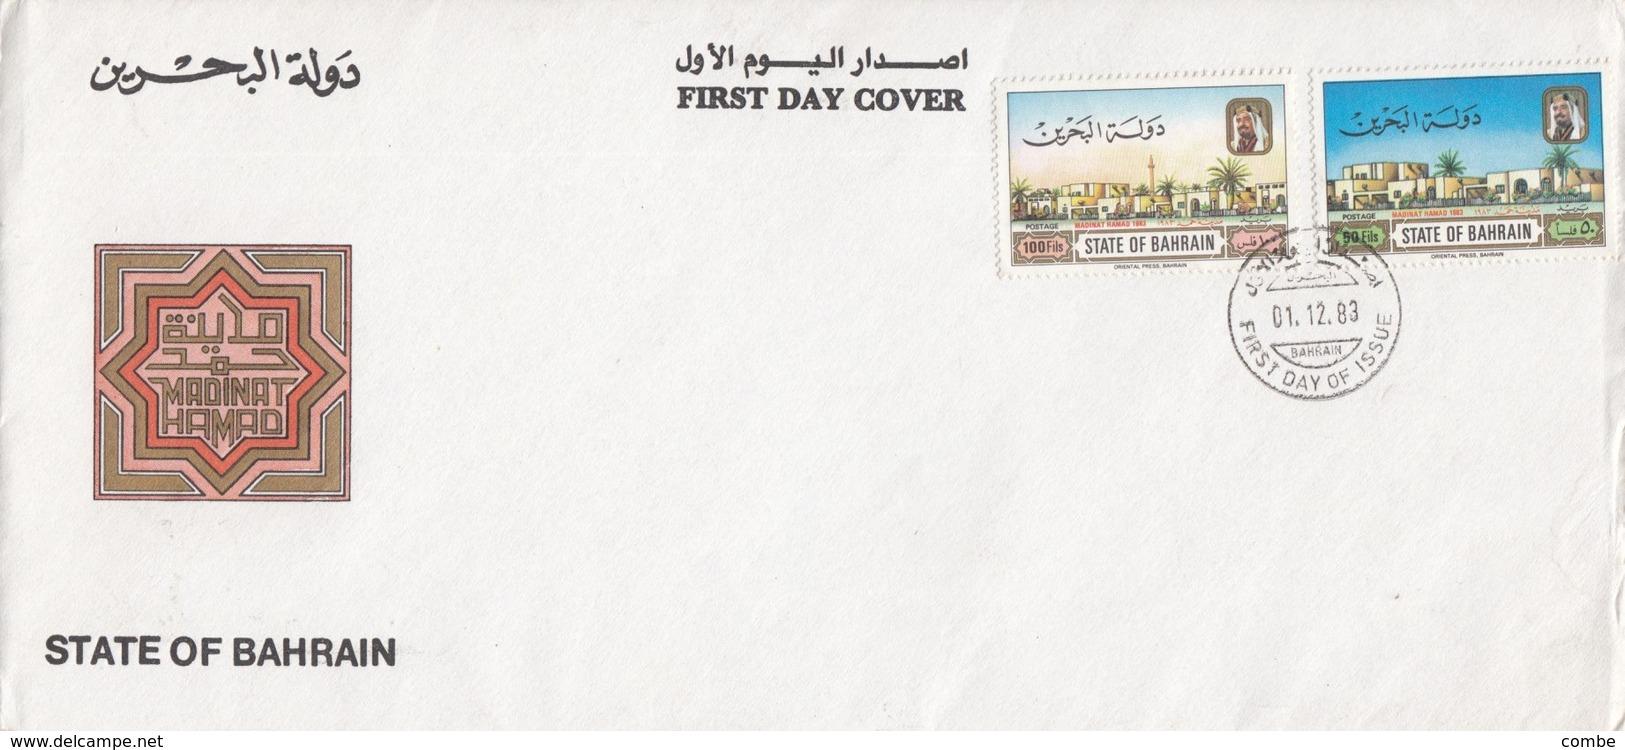 FDC BAHRAIN. 1 12 83. MADINAT HAMAD - Bahreïn (1965-...)